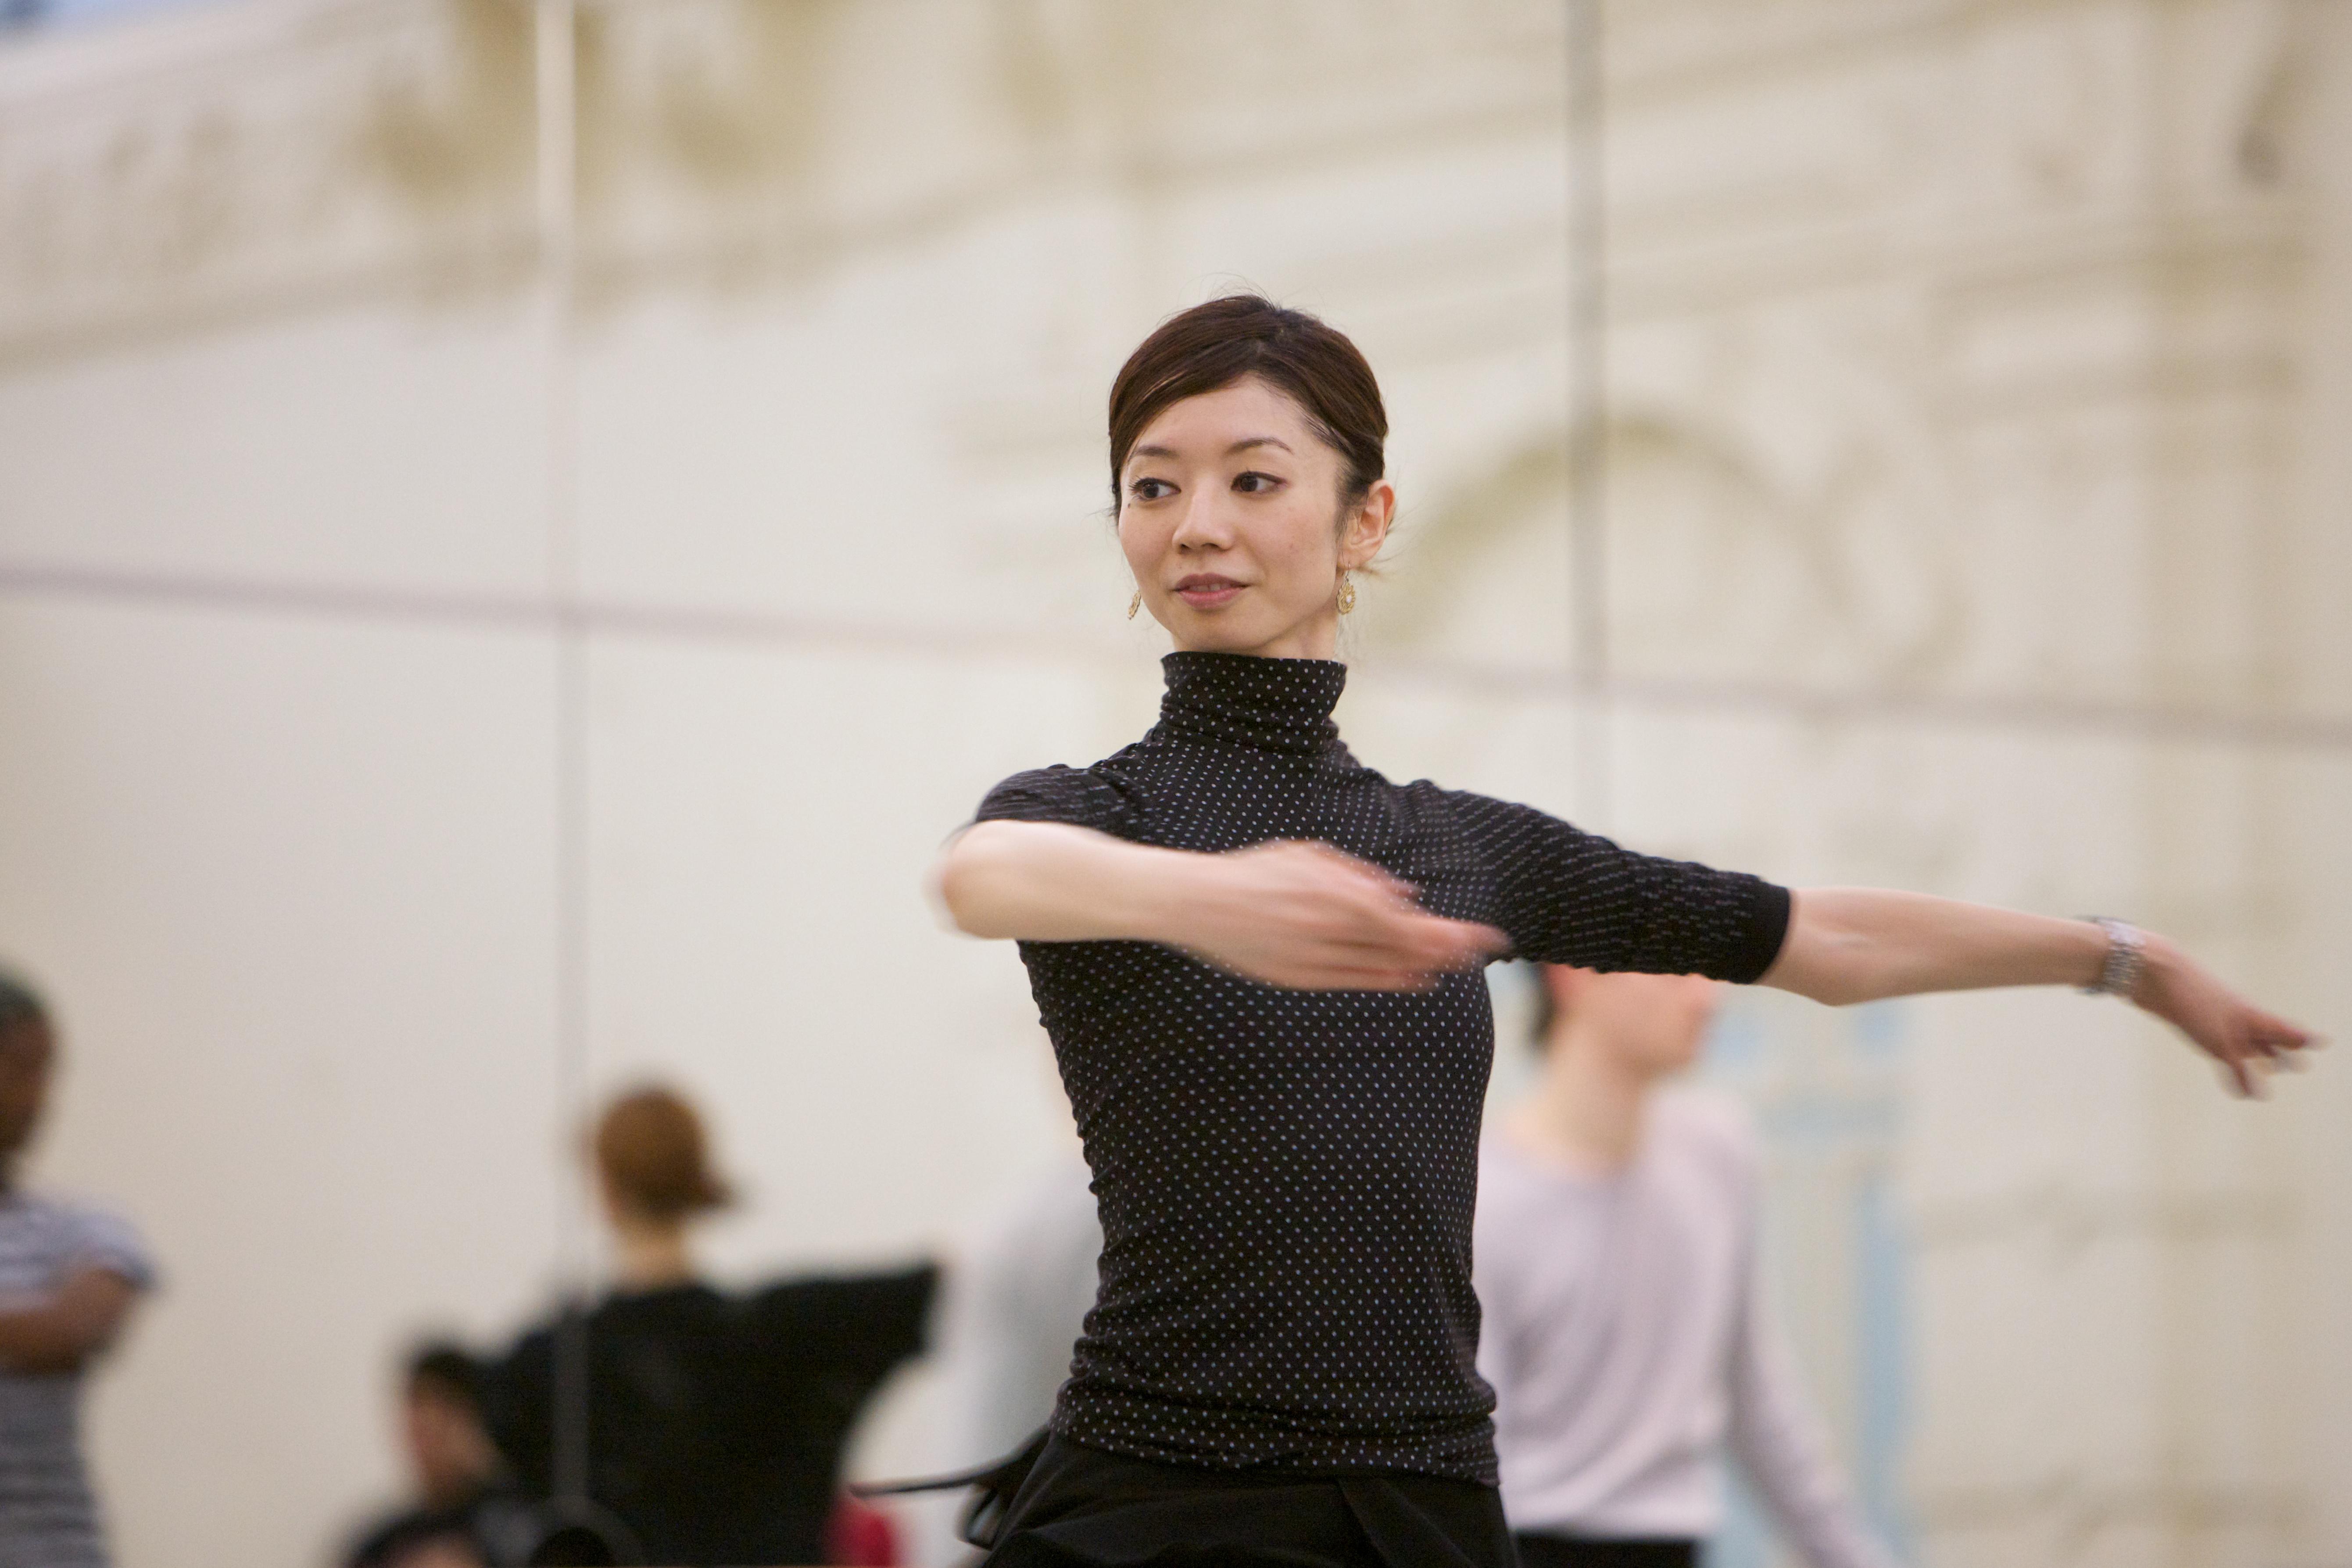 dancer rehearsing